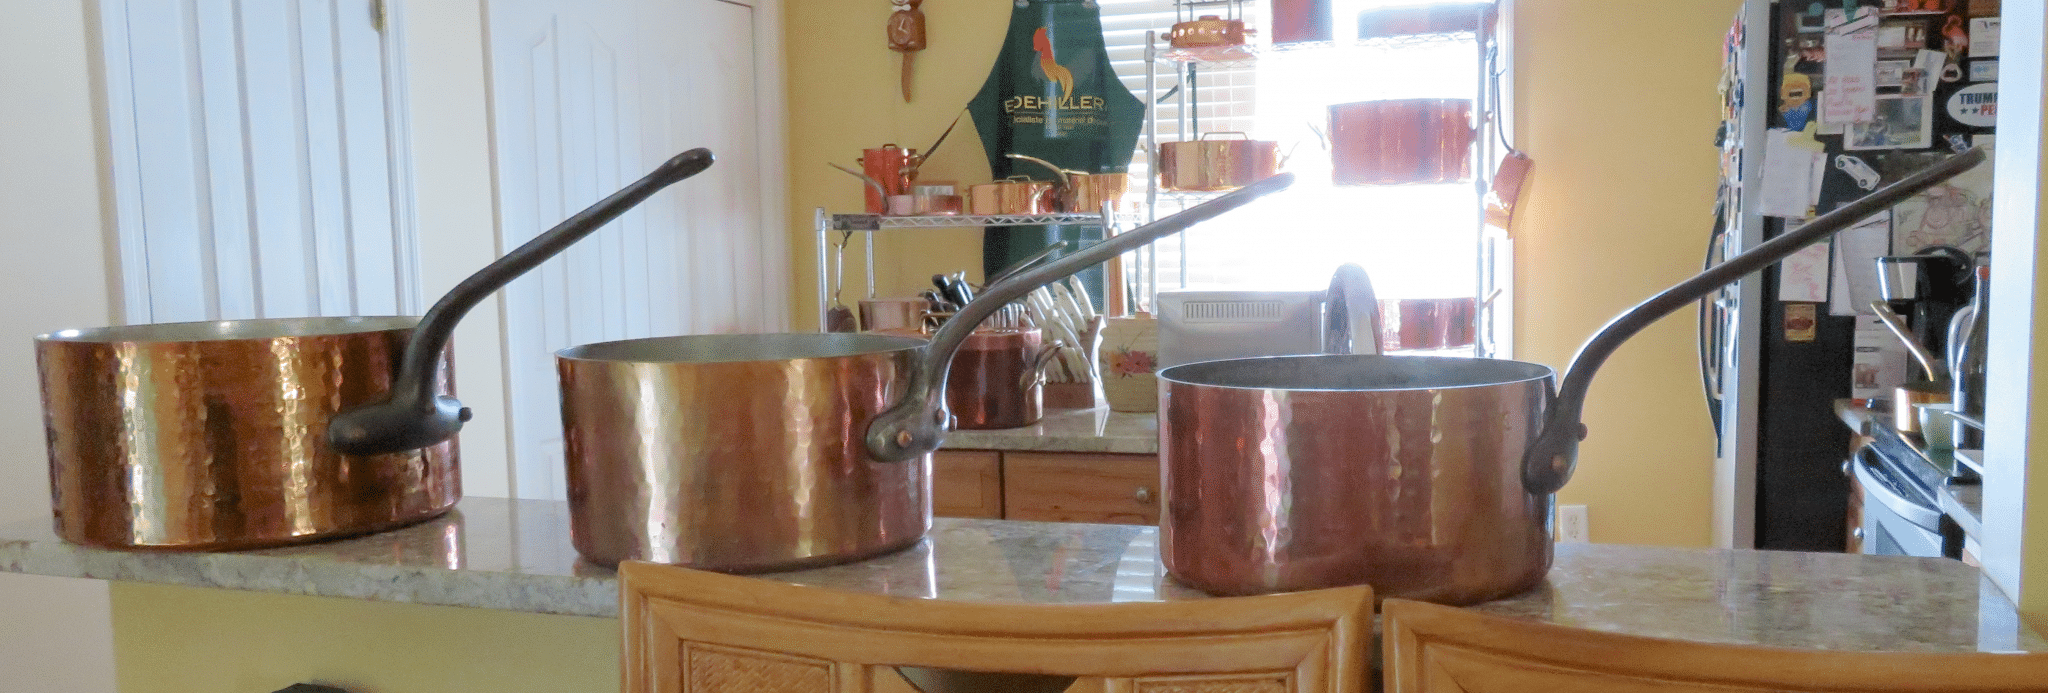 Stephen's batterie de cuisine